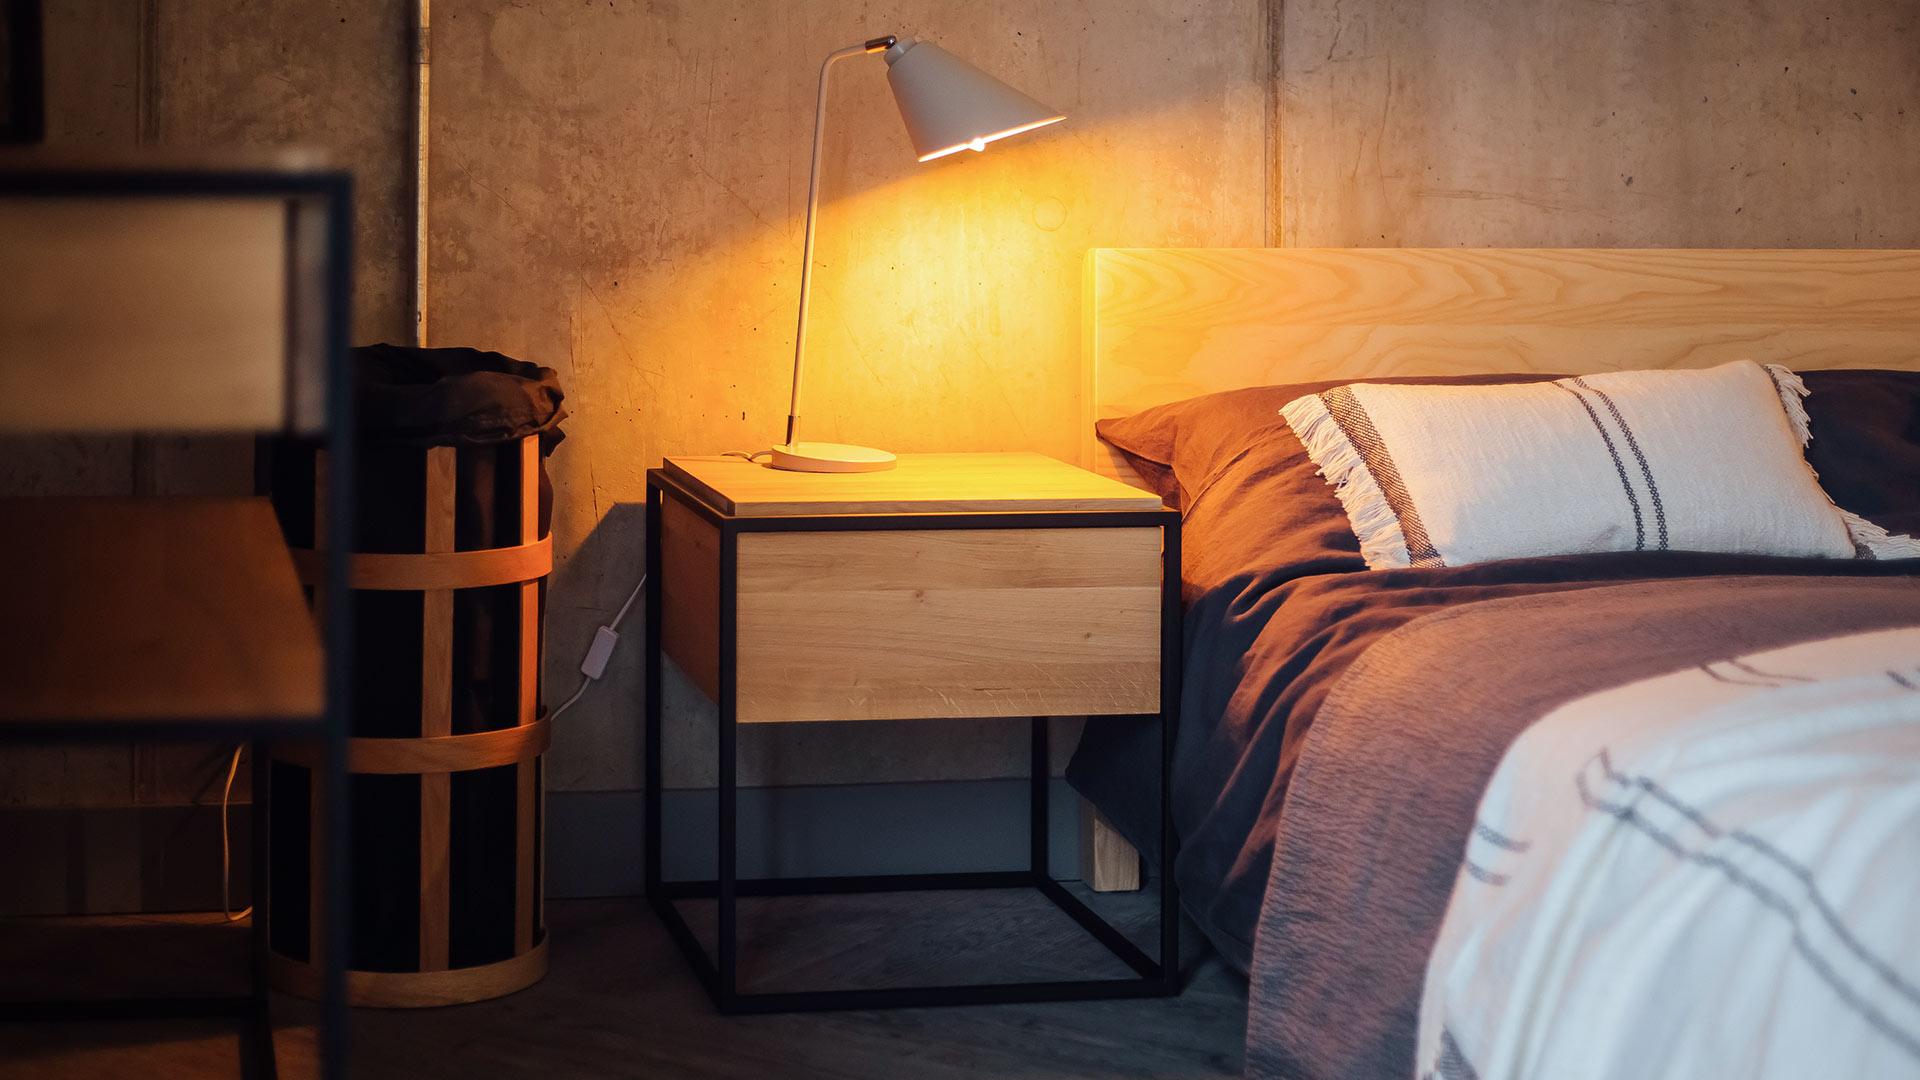 monolit-bedside-table-oak-and-black